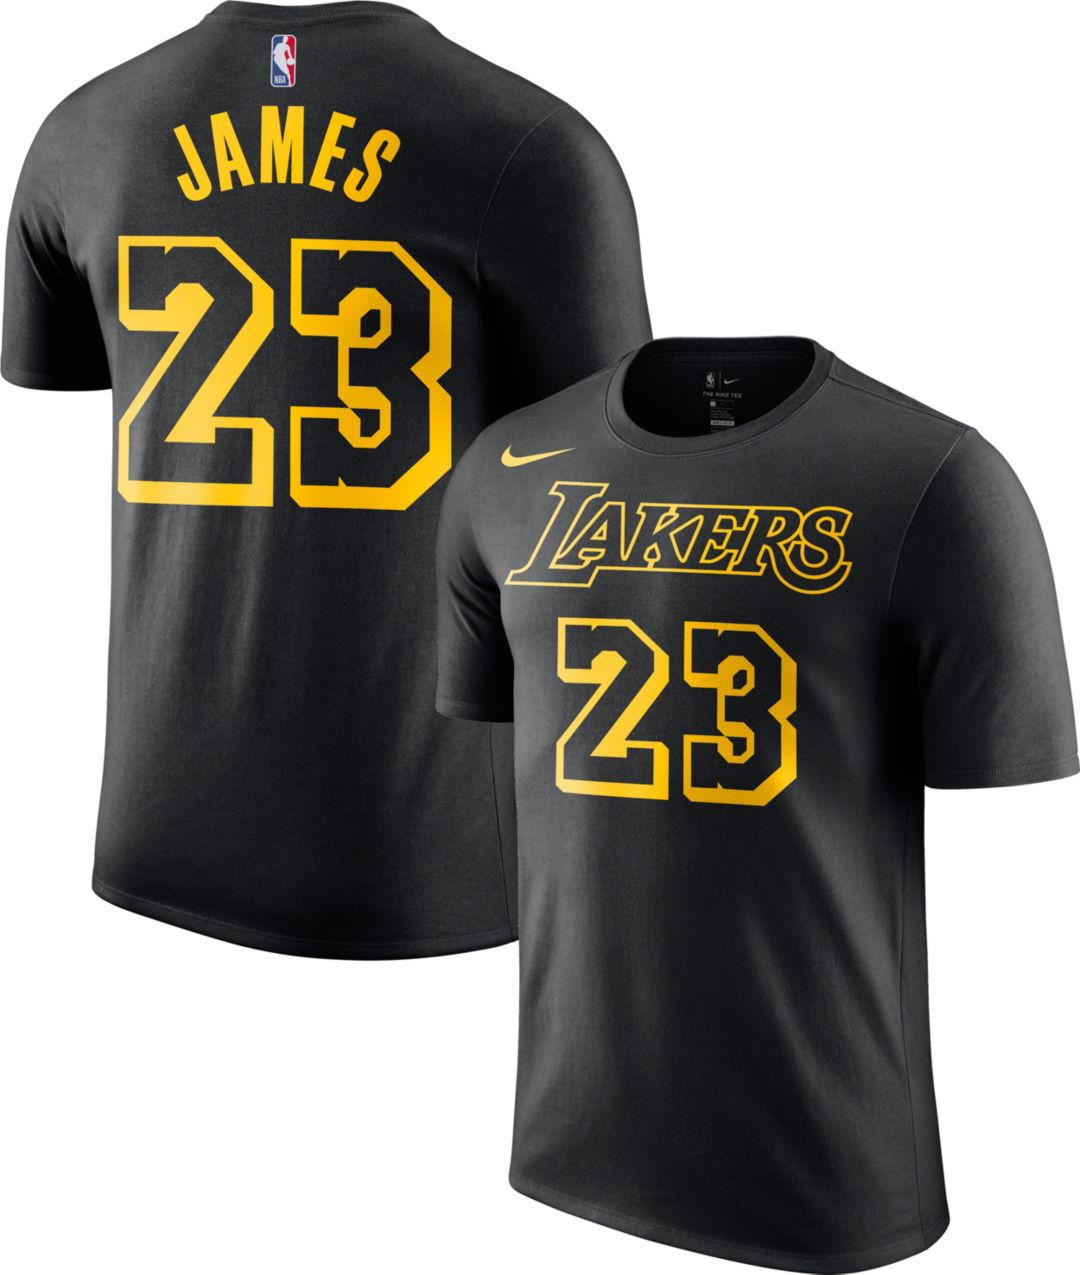 bc1b945c Nike Youth Los Angeles Lakers LeBron James Dri-FIT City Edition T-Shirt 1